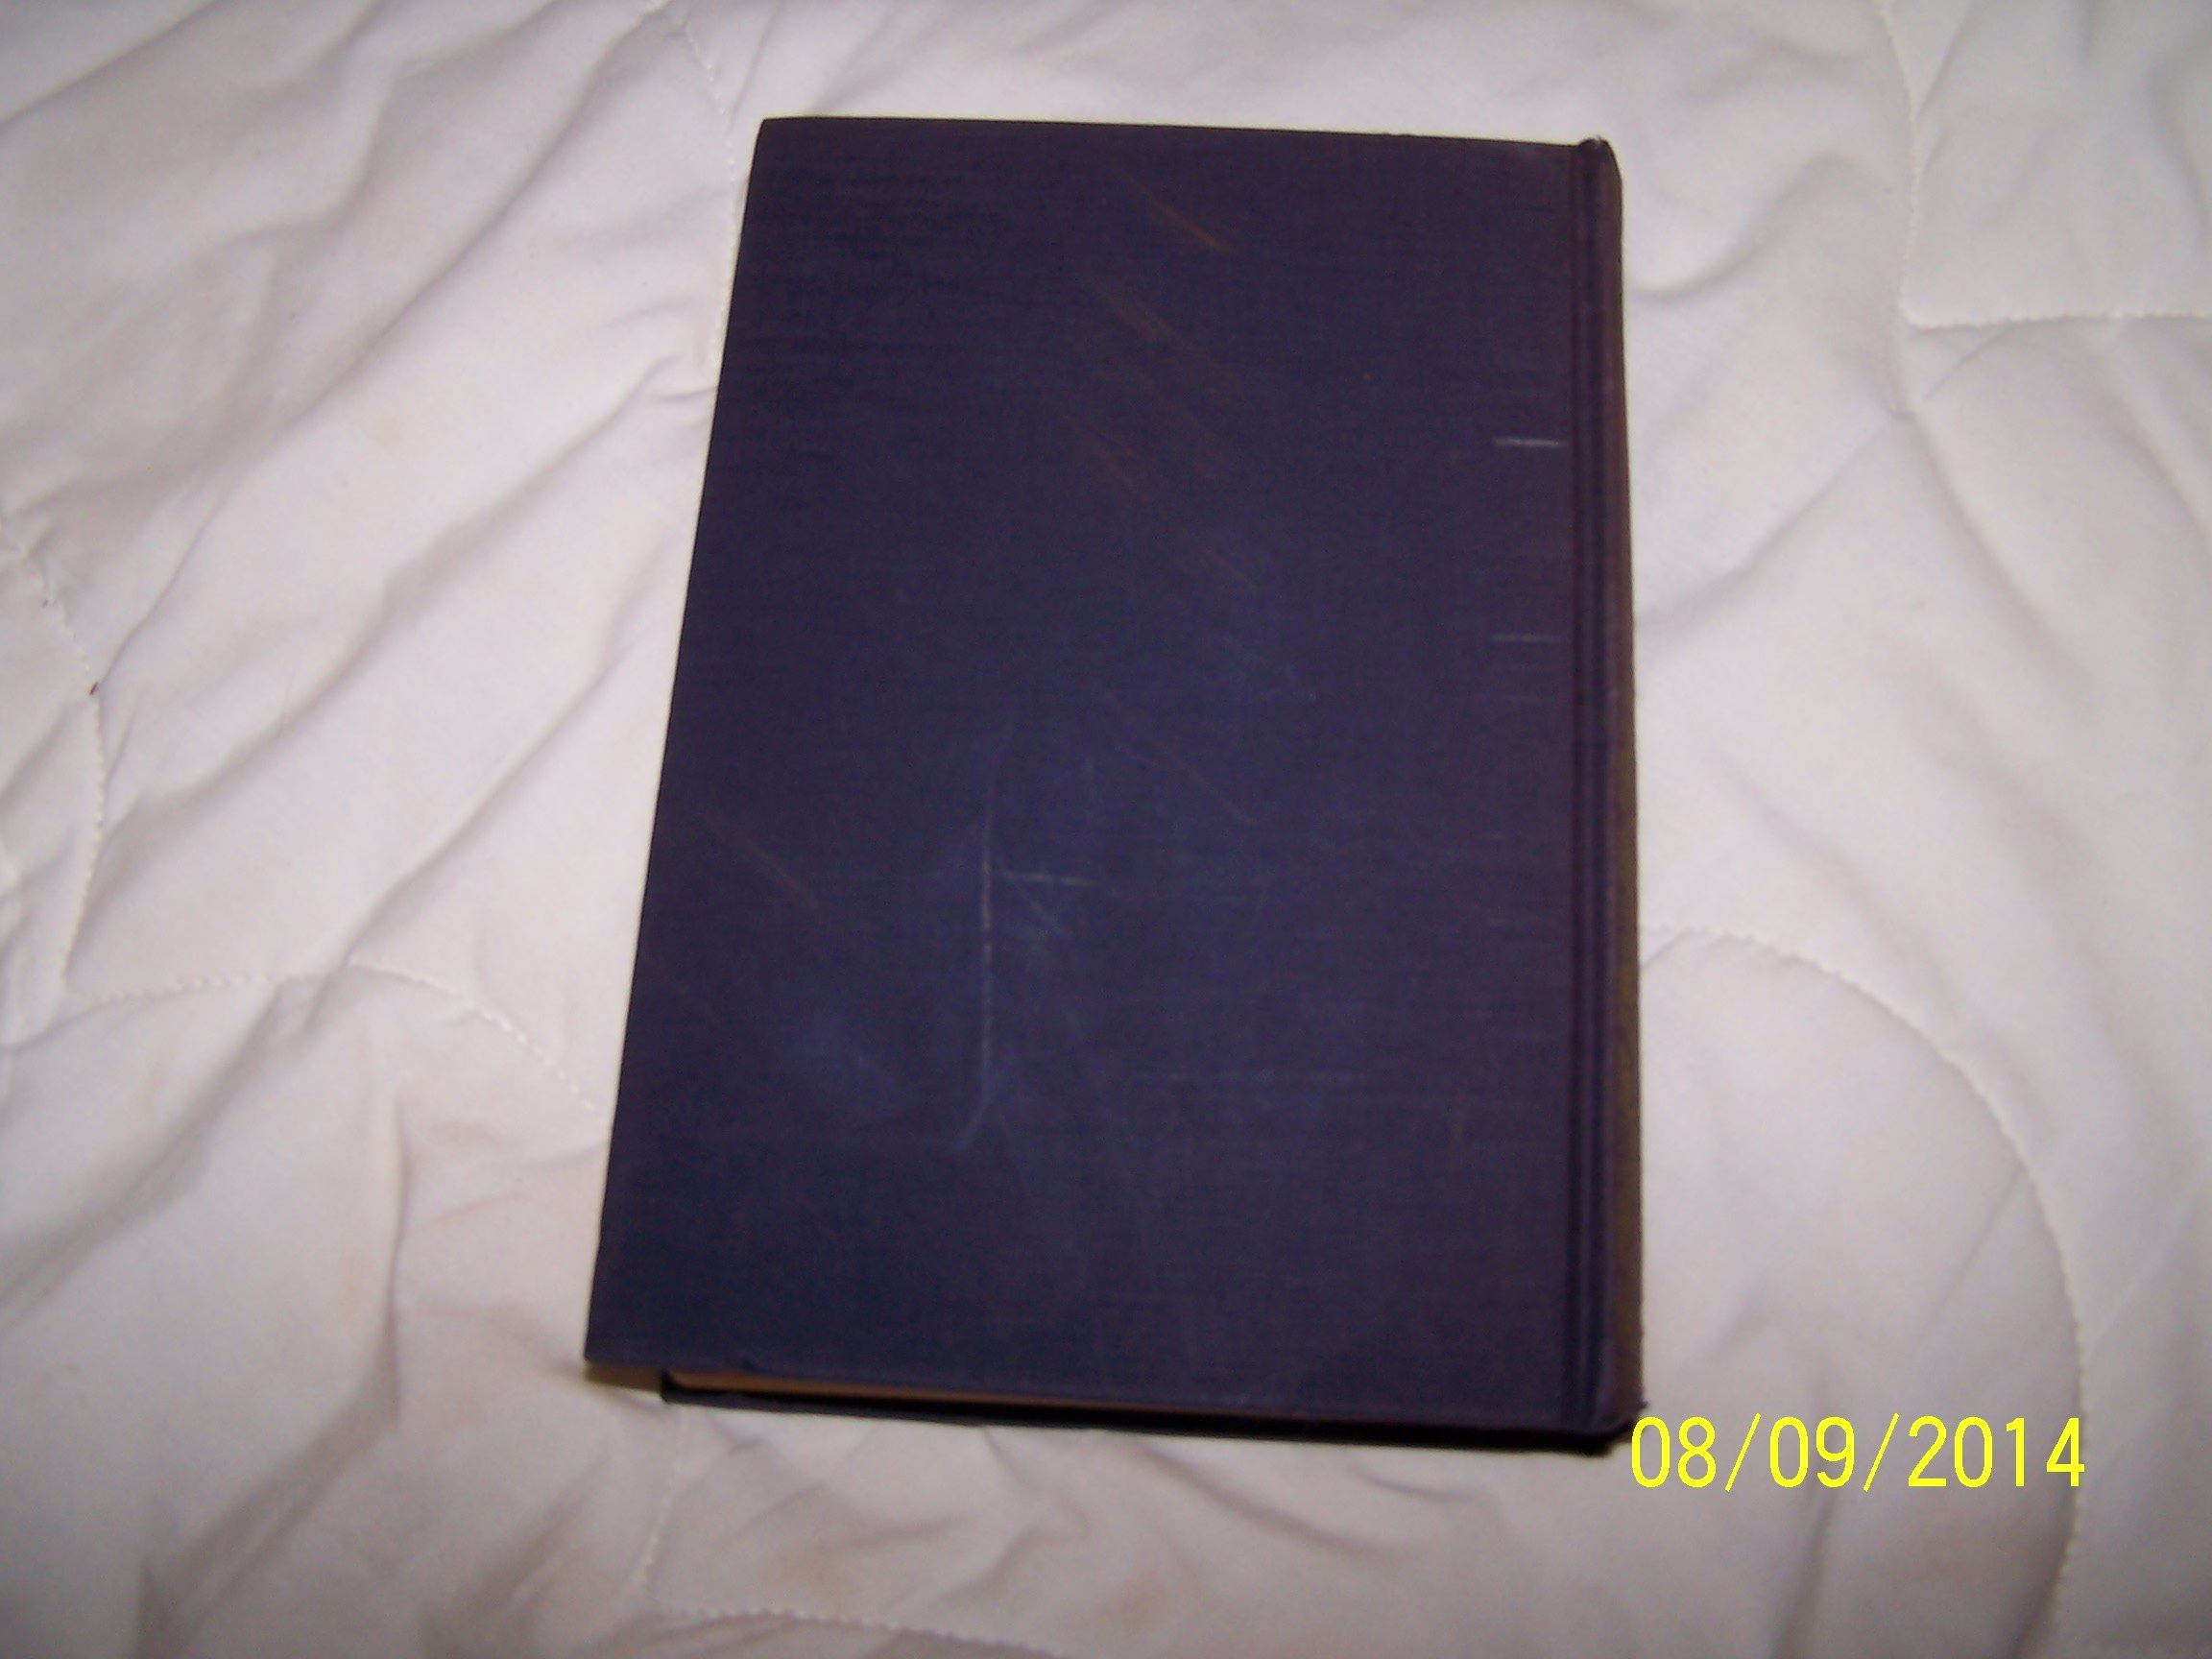 Lord Jim book image